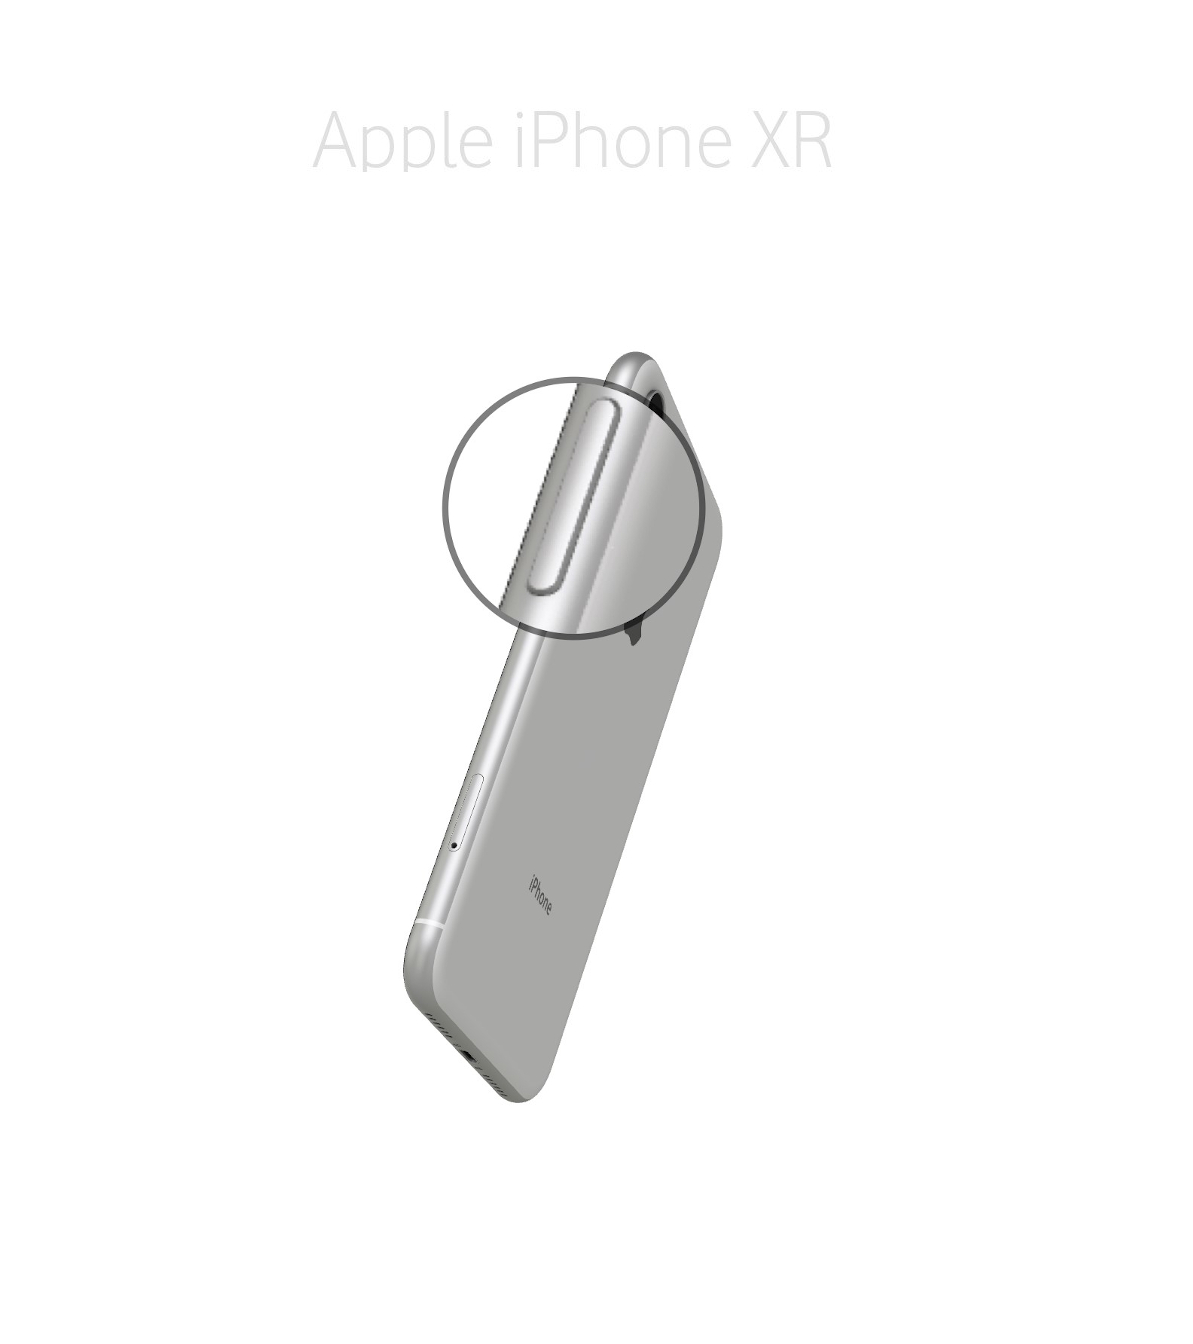 Laga onoff (sidoknapp) iPhone XR